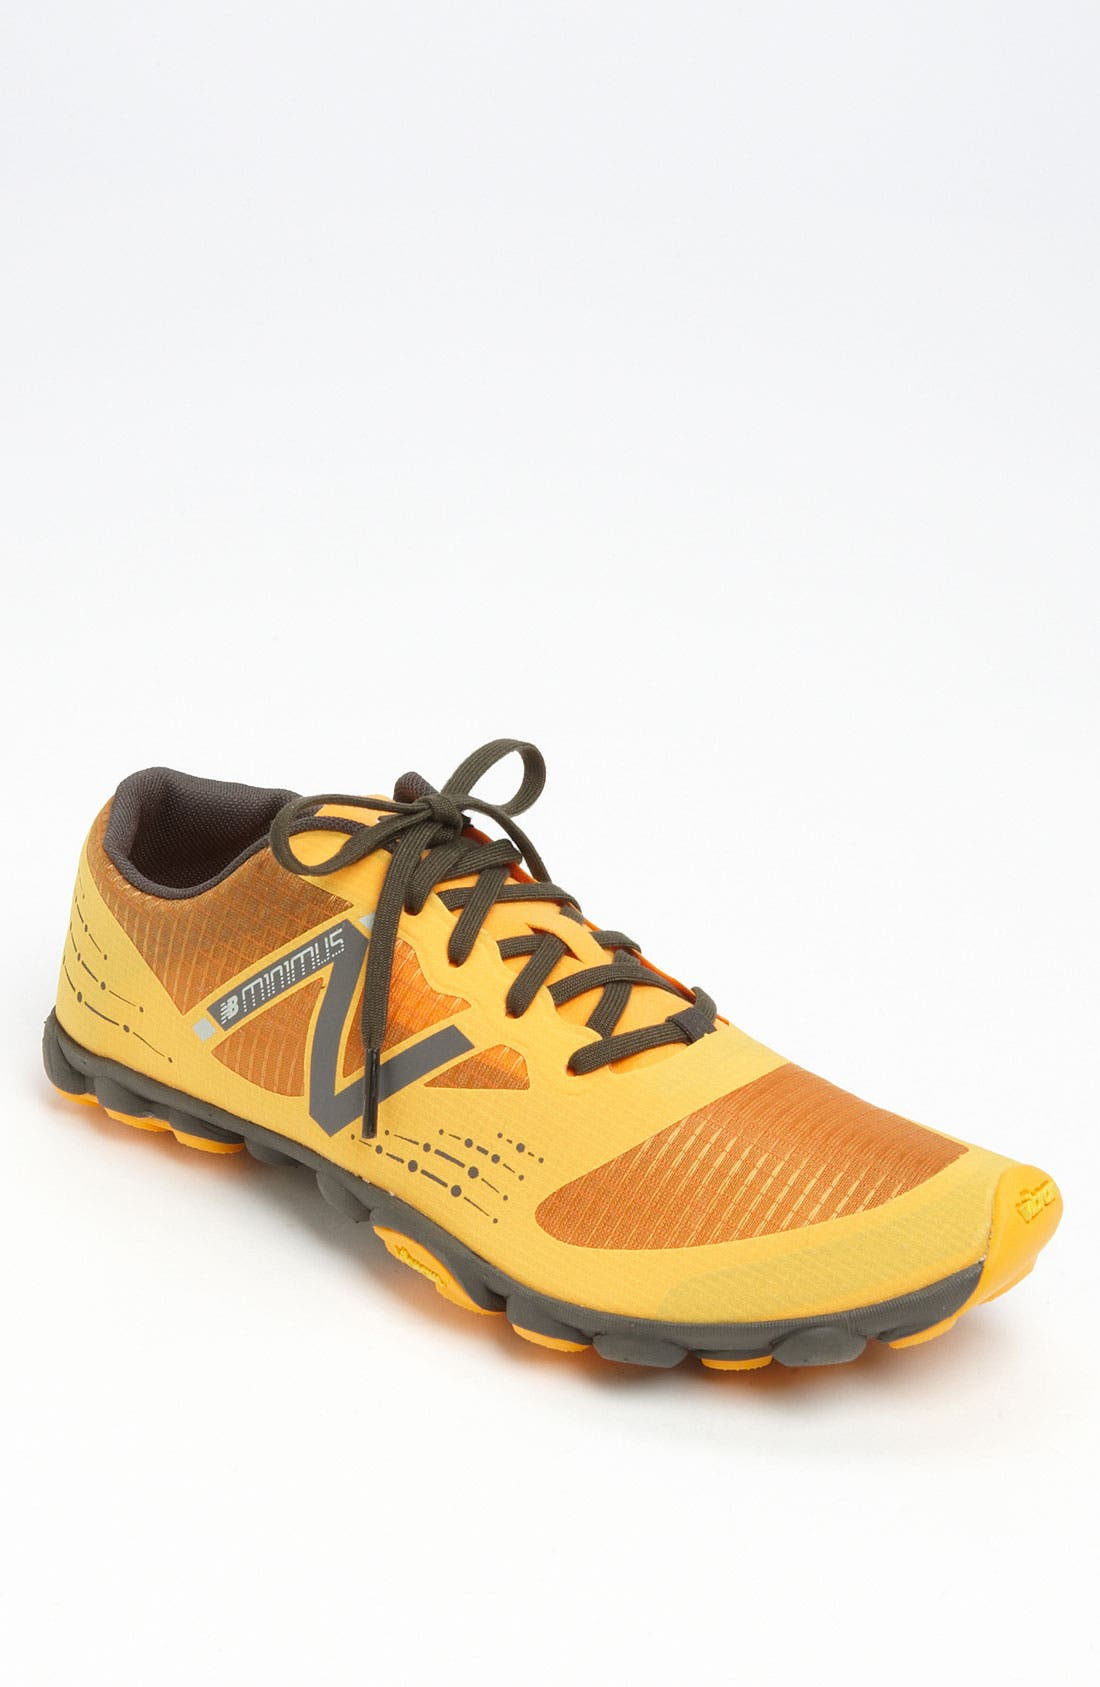 Alternate Image 1 Selected - New Balance 'Minimus' Running Shoe (Men)